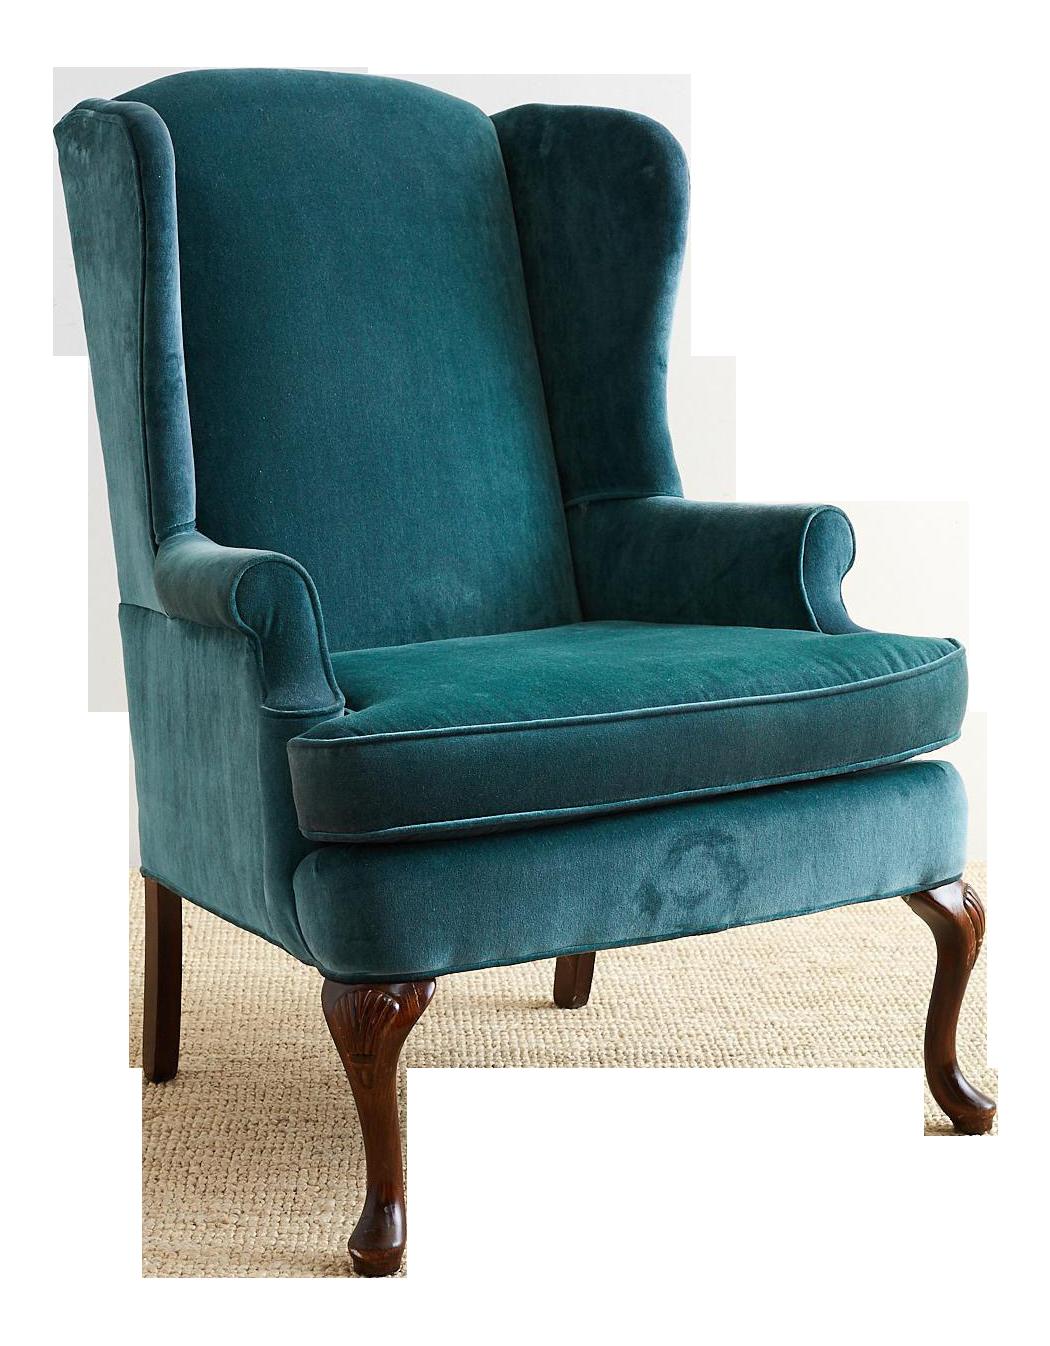 Superieur 20th Century Queen Anne Teal Velvet Wingback Armchair